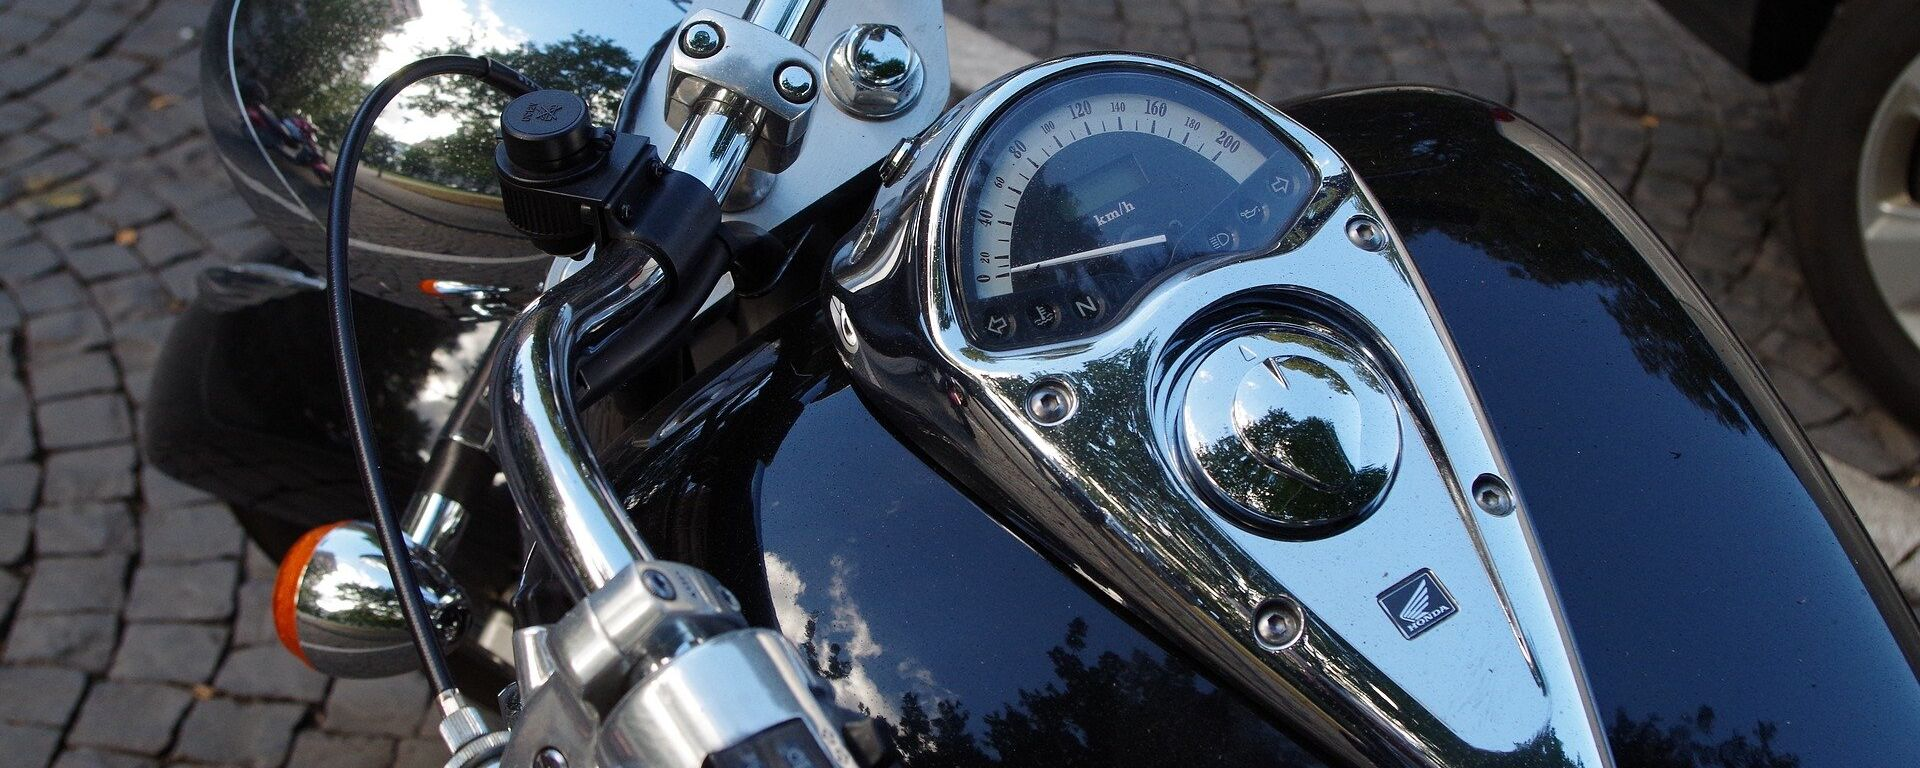 Мотоцикл, архивное фото - Sputnik Тоҷикистон, 1920, 04.10.2021